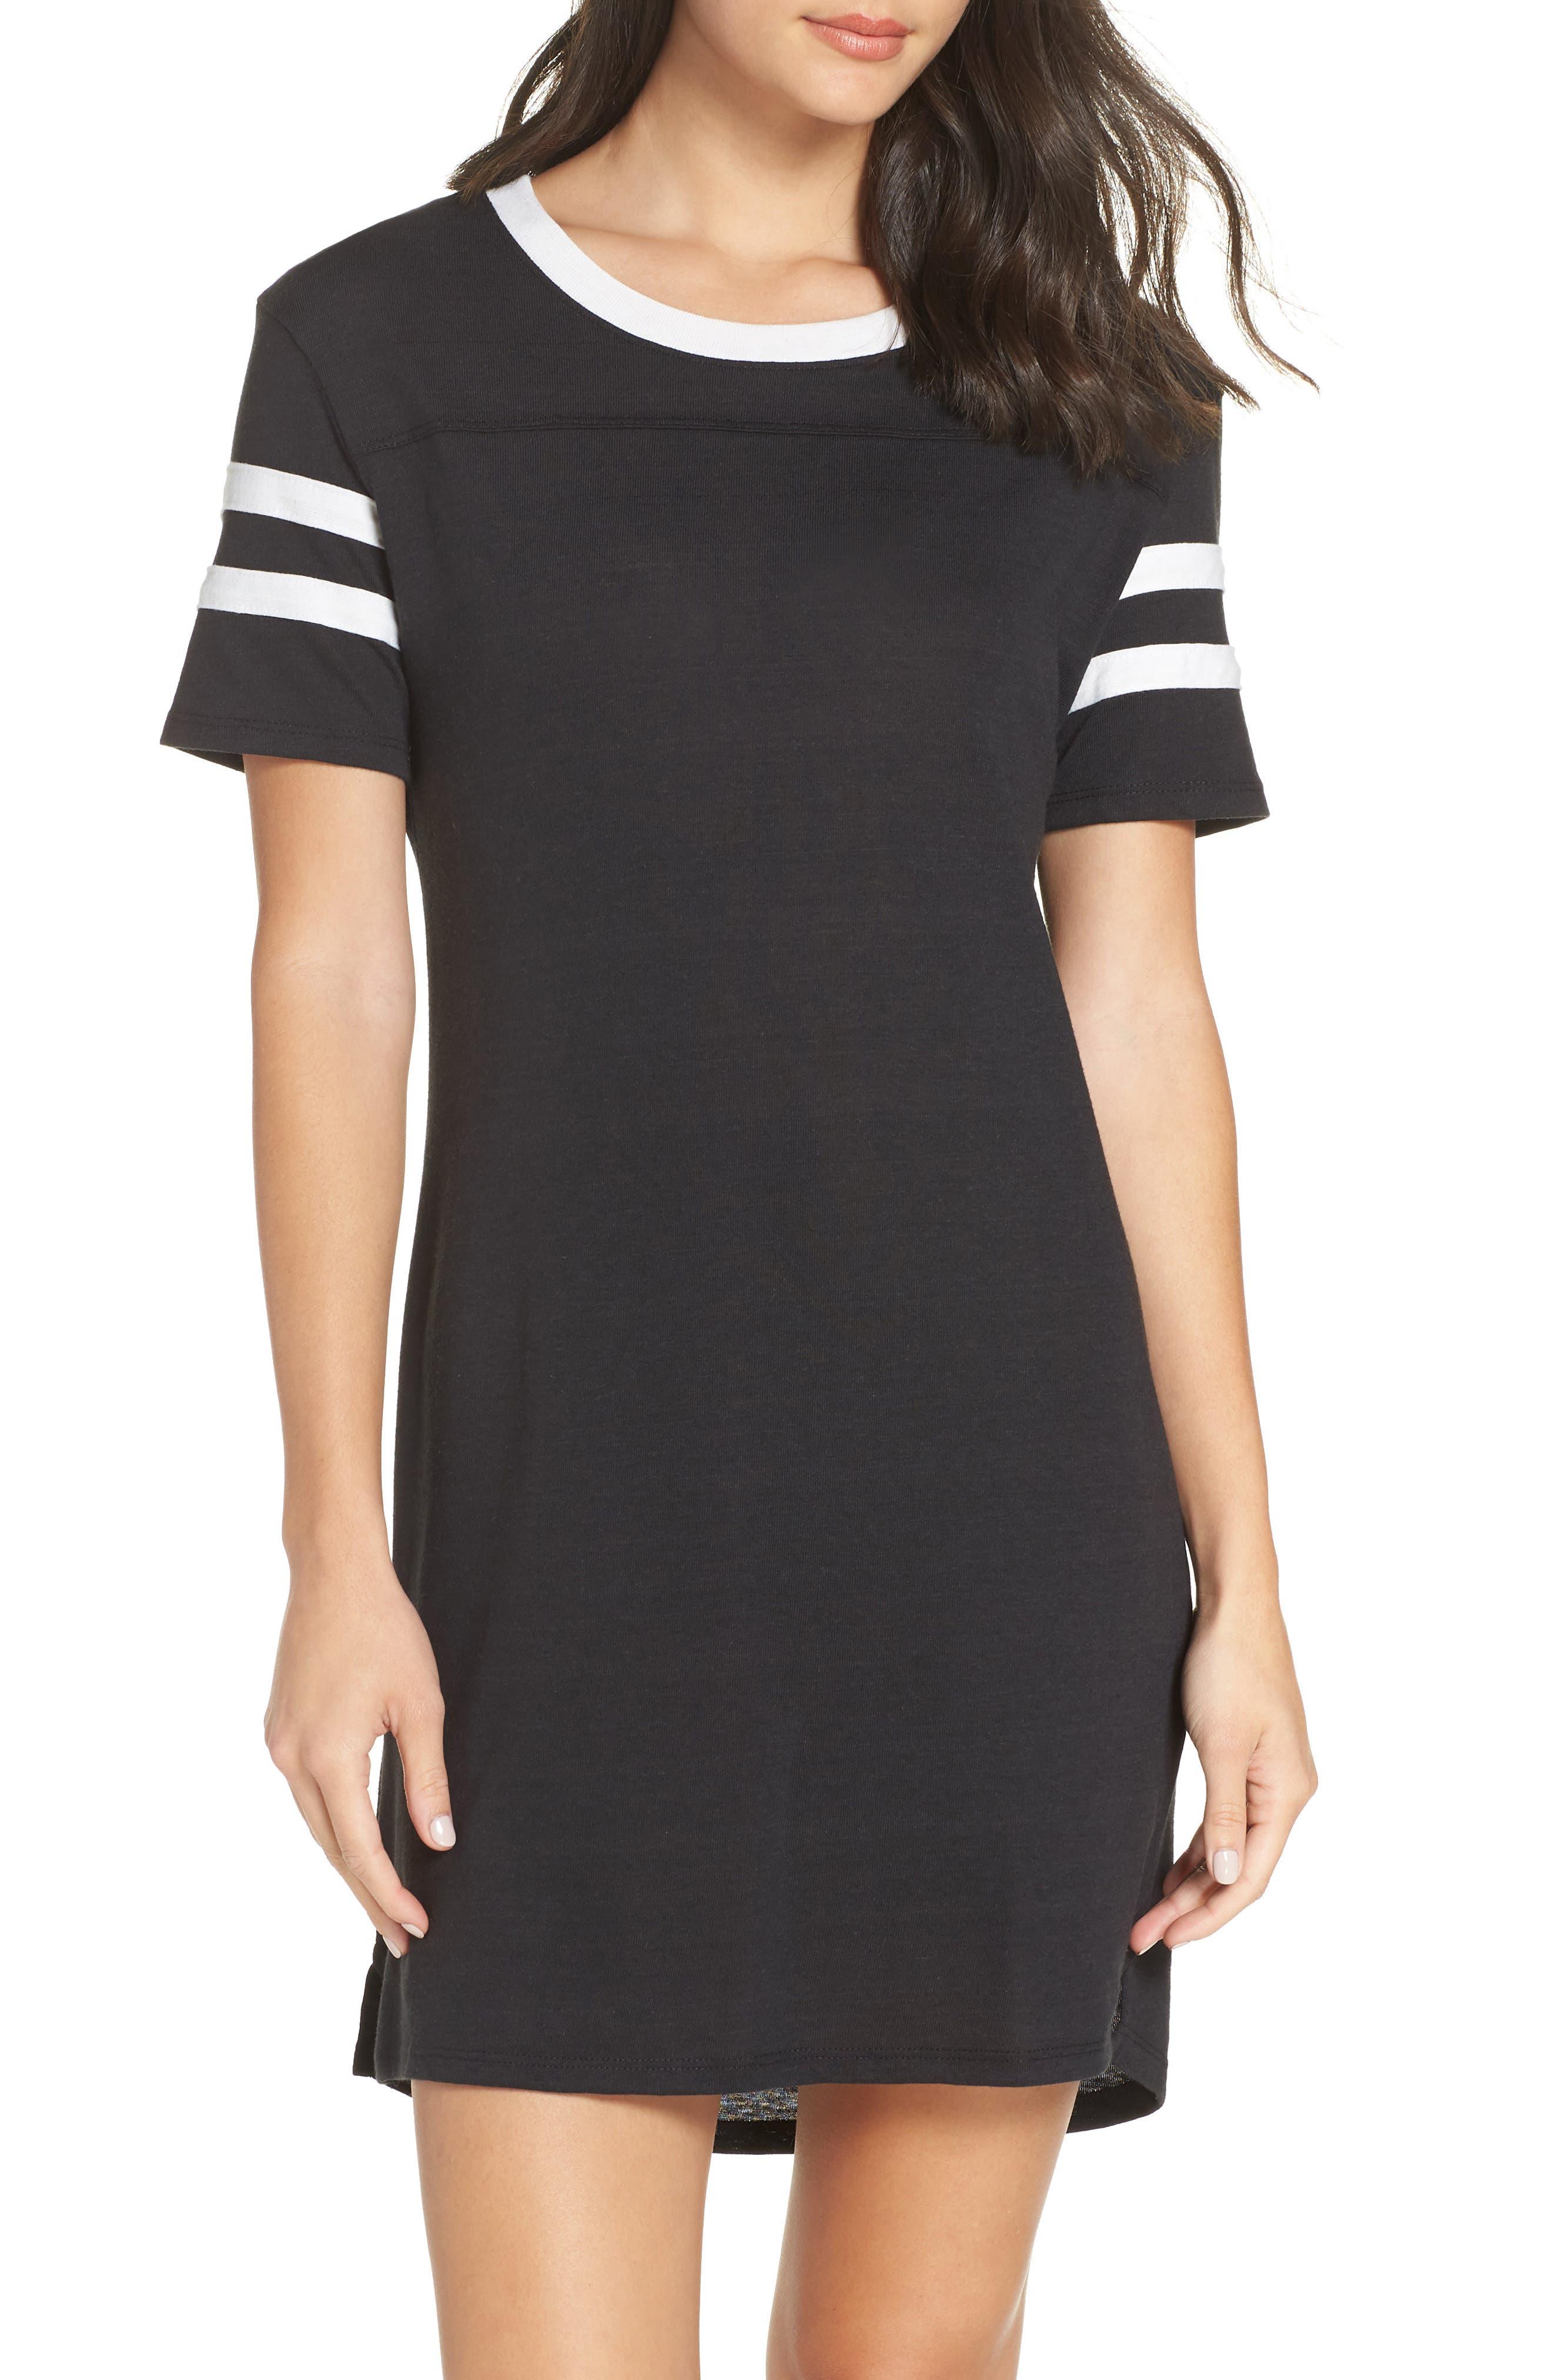 ALTERNATIVE Stadium Eco Jersey T-Shirt Dress in Eco True Black